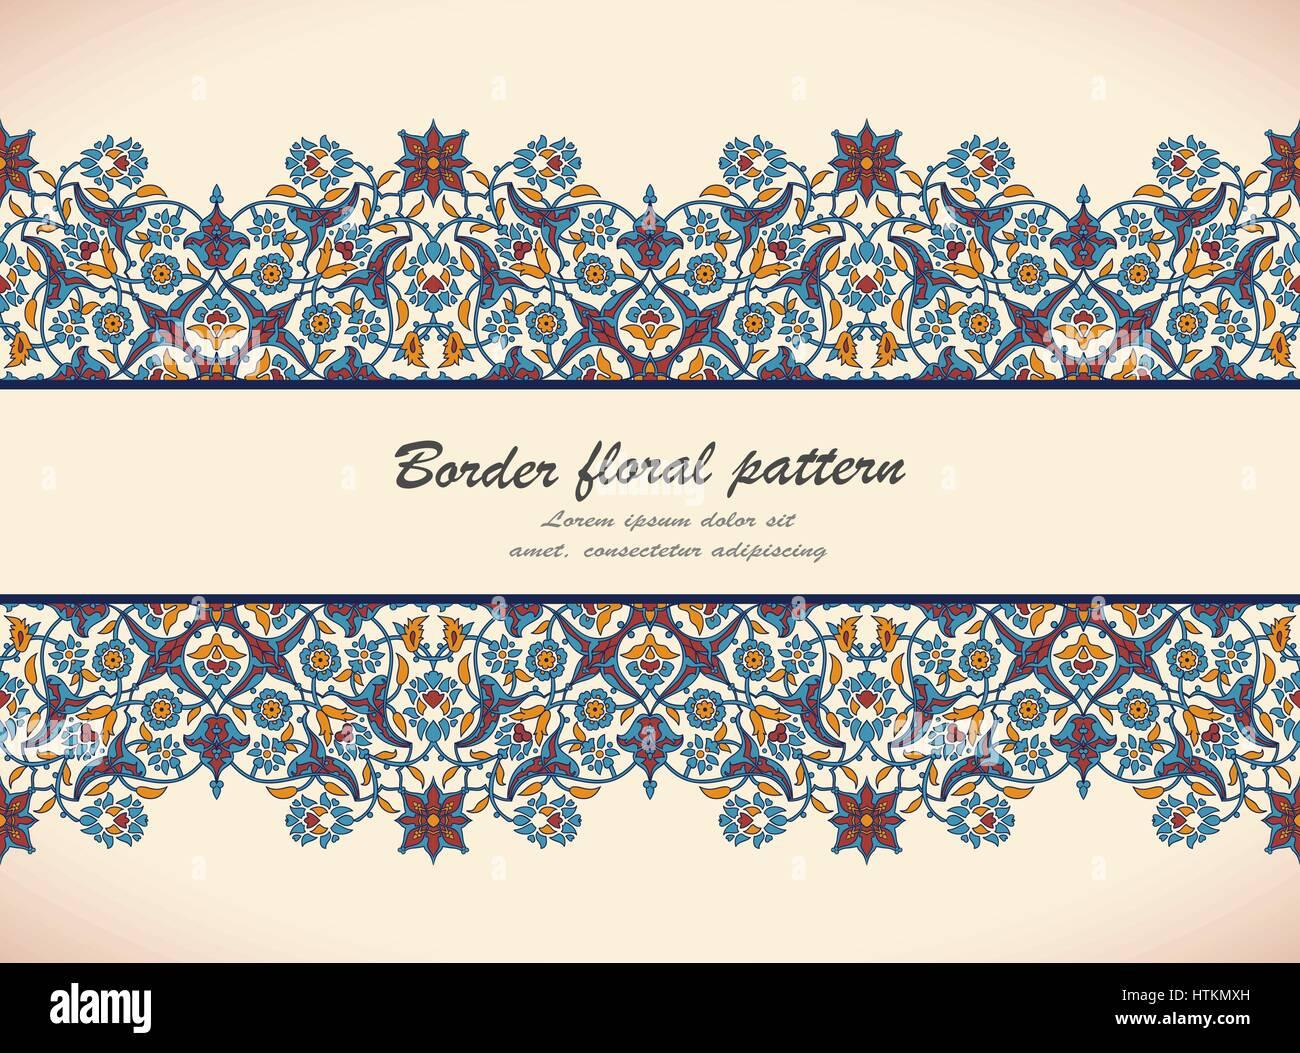 d64db78bccb3 Arabesque vintage seamless border design template vector. Eastern style  pattern. Elegant floral decoration print. Ornamental illustration for  invitati